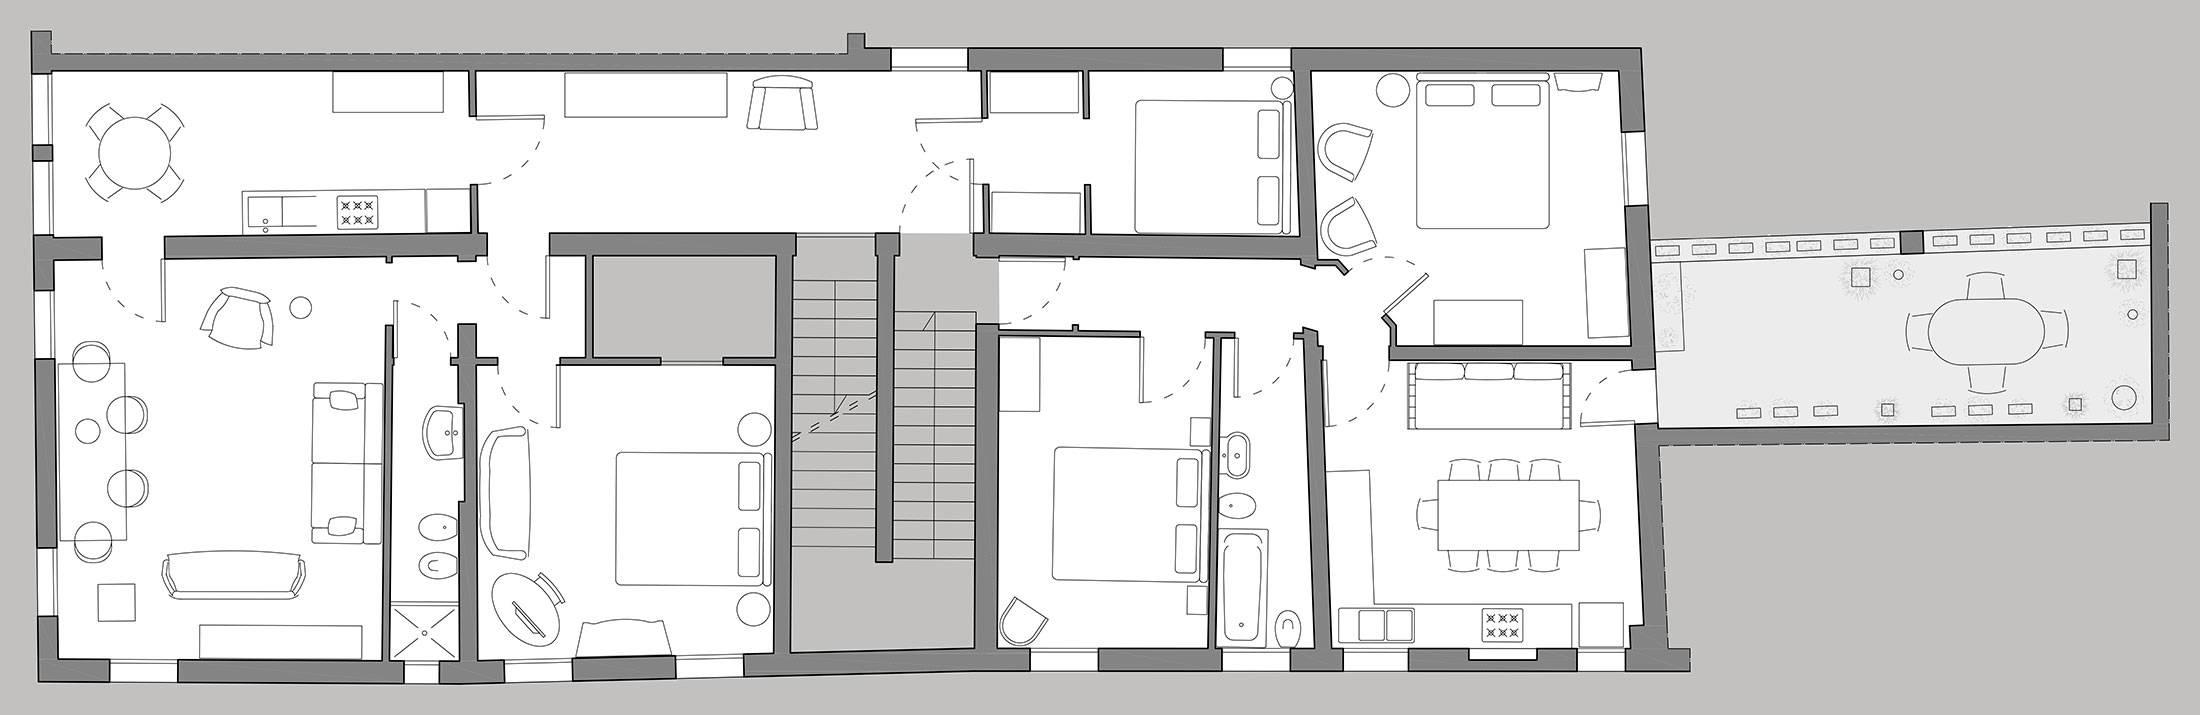 Gritti Premium floor plan